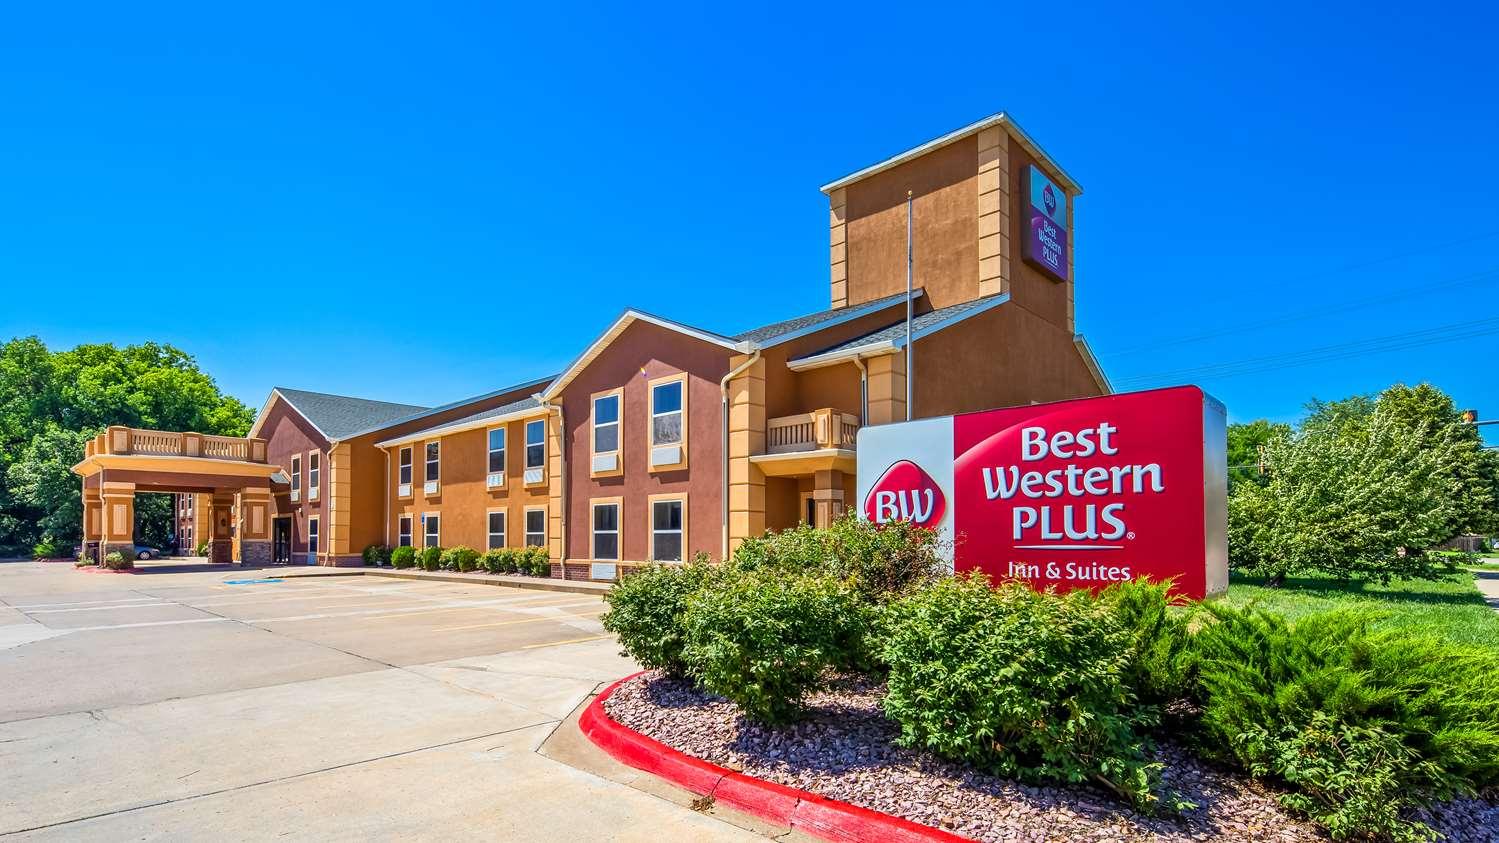 Exterior view - Best Western Plus Midwest Inn & Suites Salina